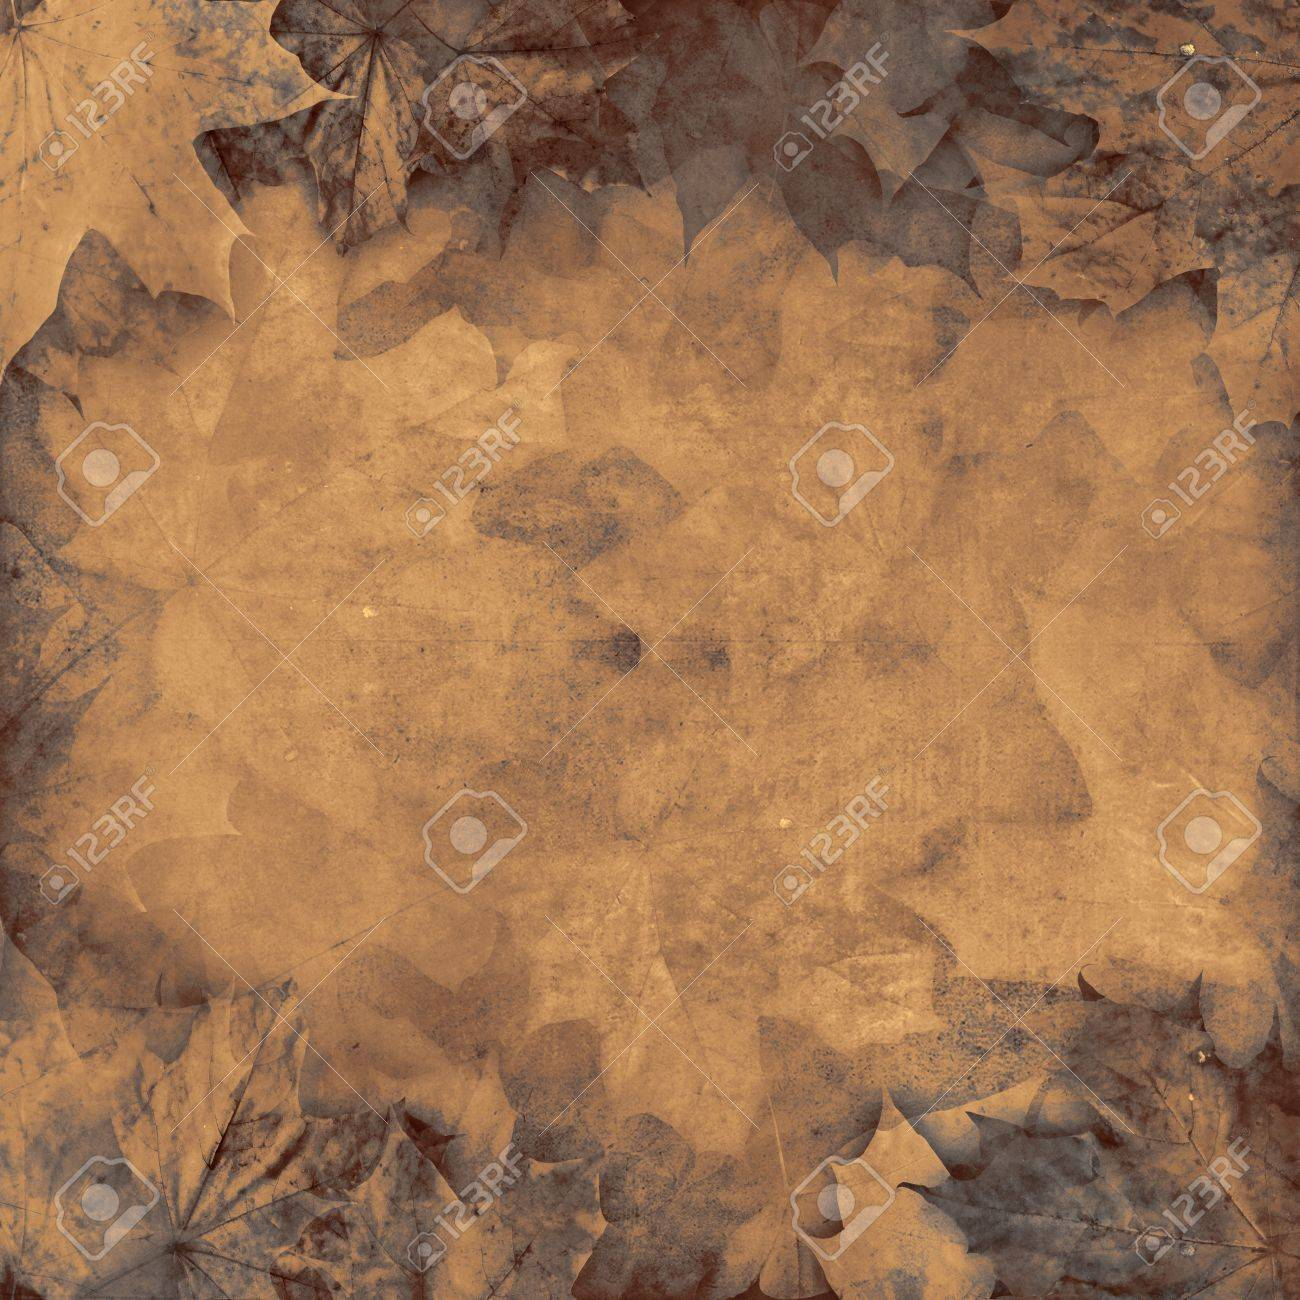 Old leaves sepia vintage autumn background illustration Stock Photo - 14619599